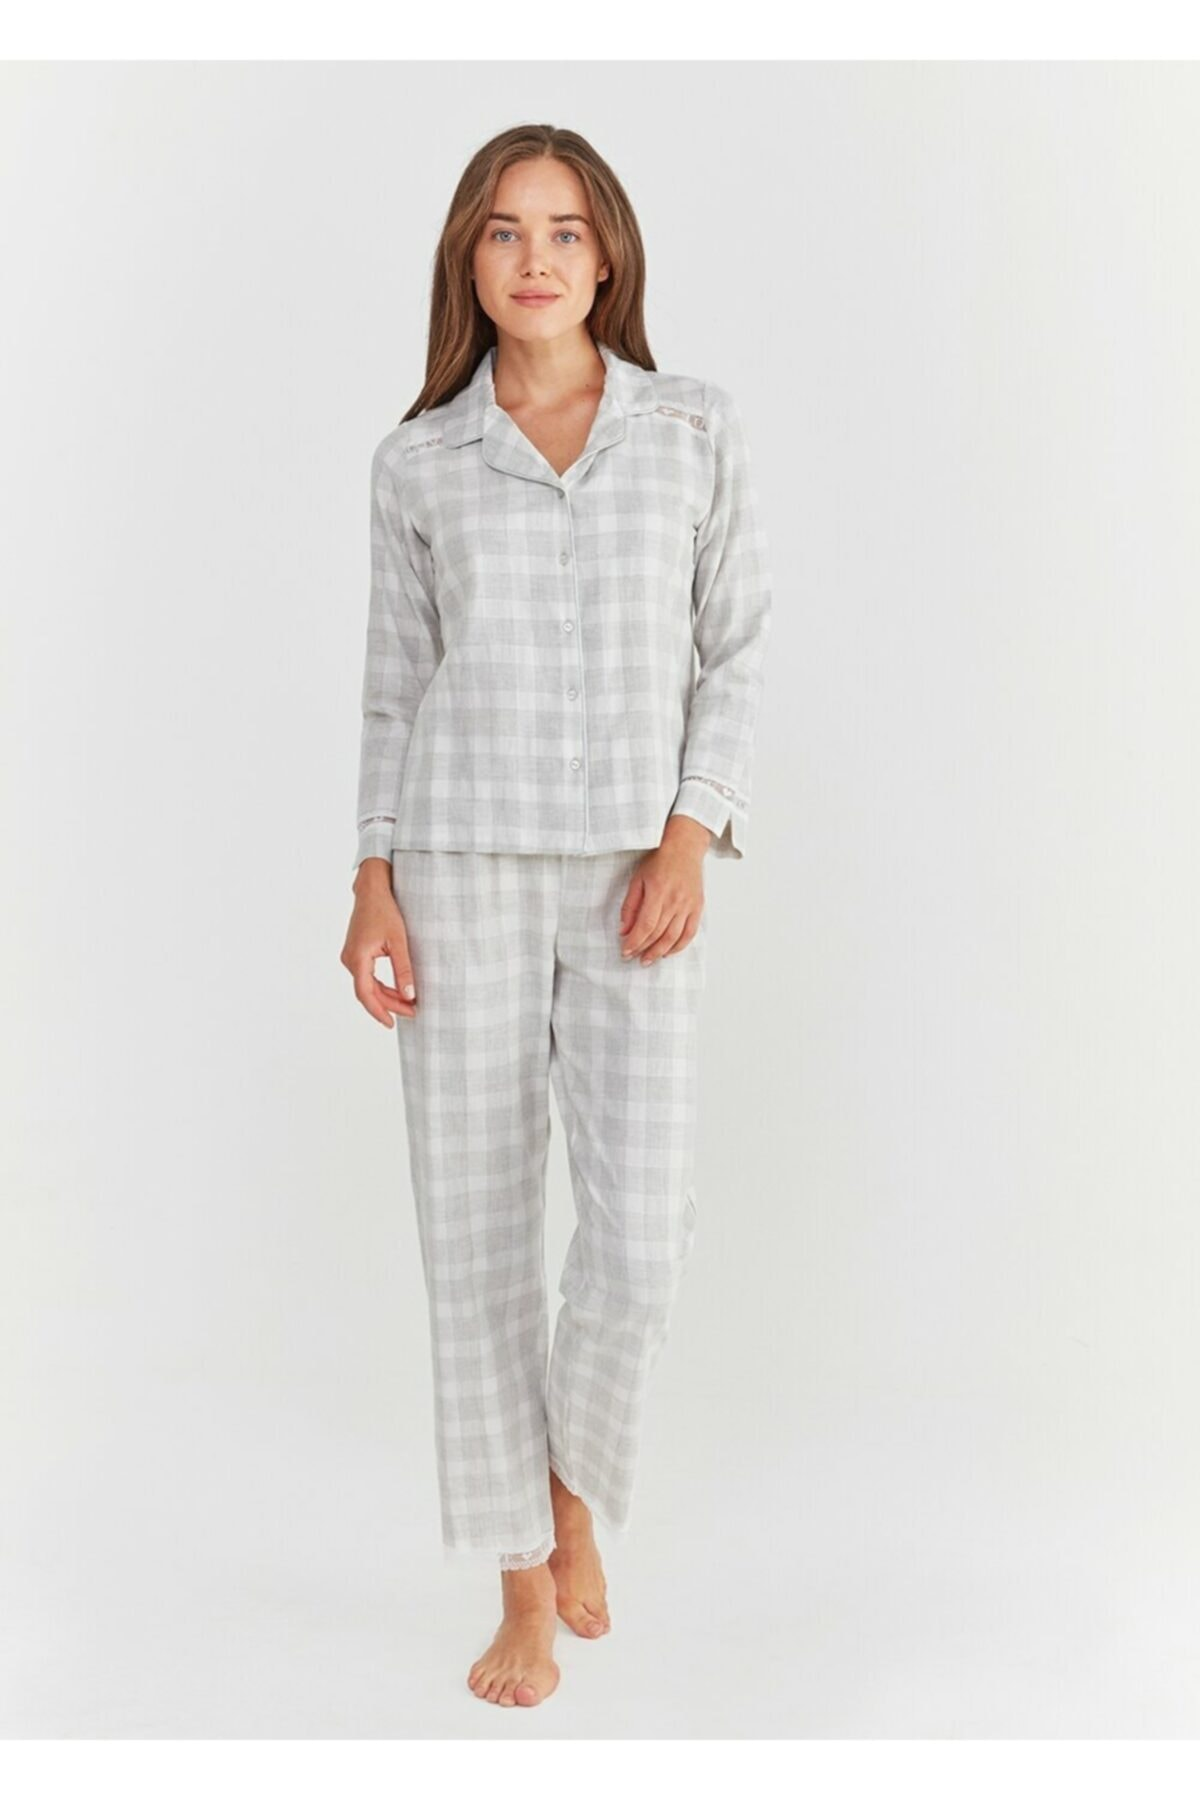 SUWEN Sofia Maskulen Pijama Takımı 2